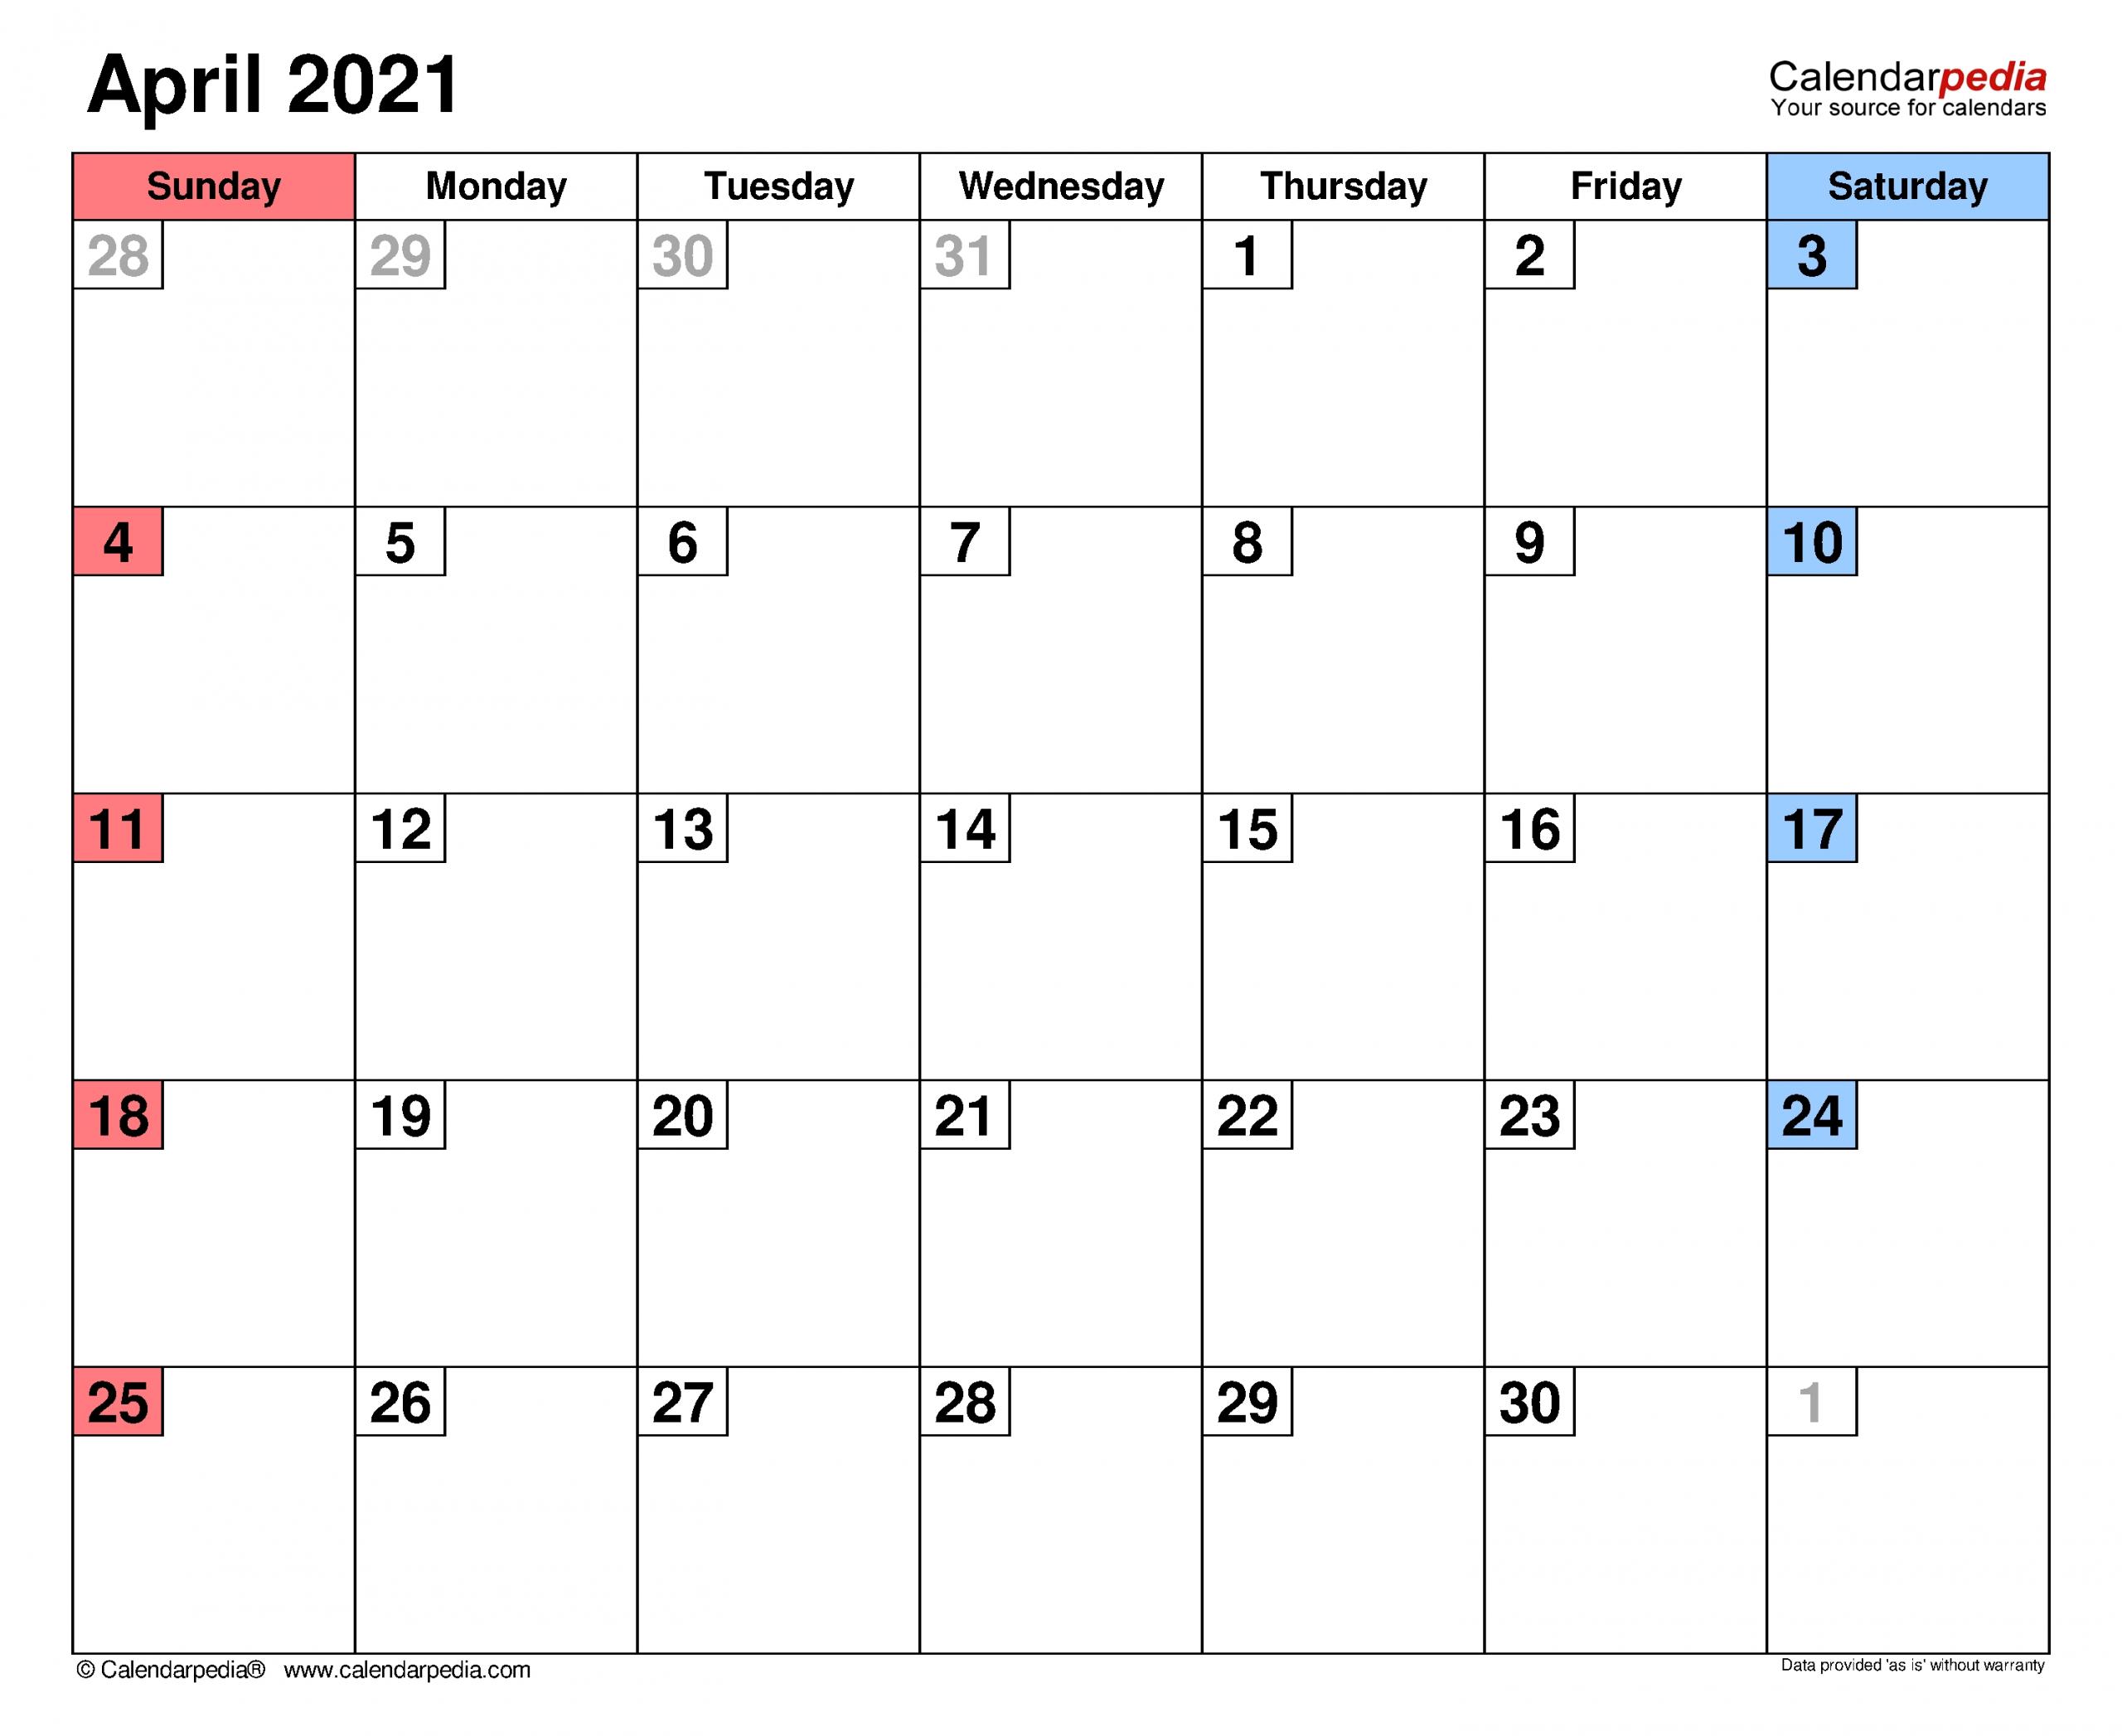 Get Calendar Of April 2021 School